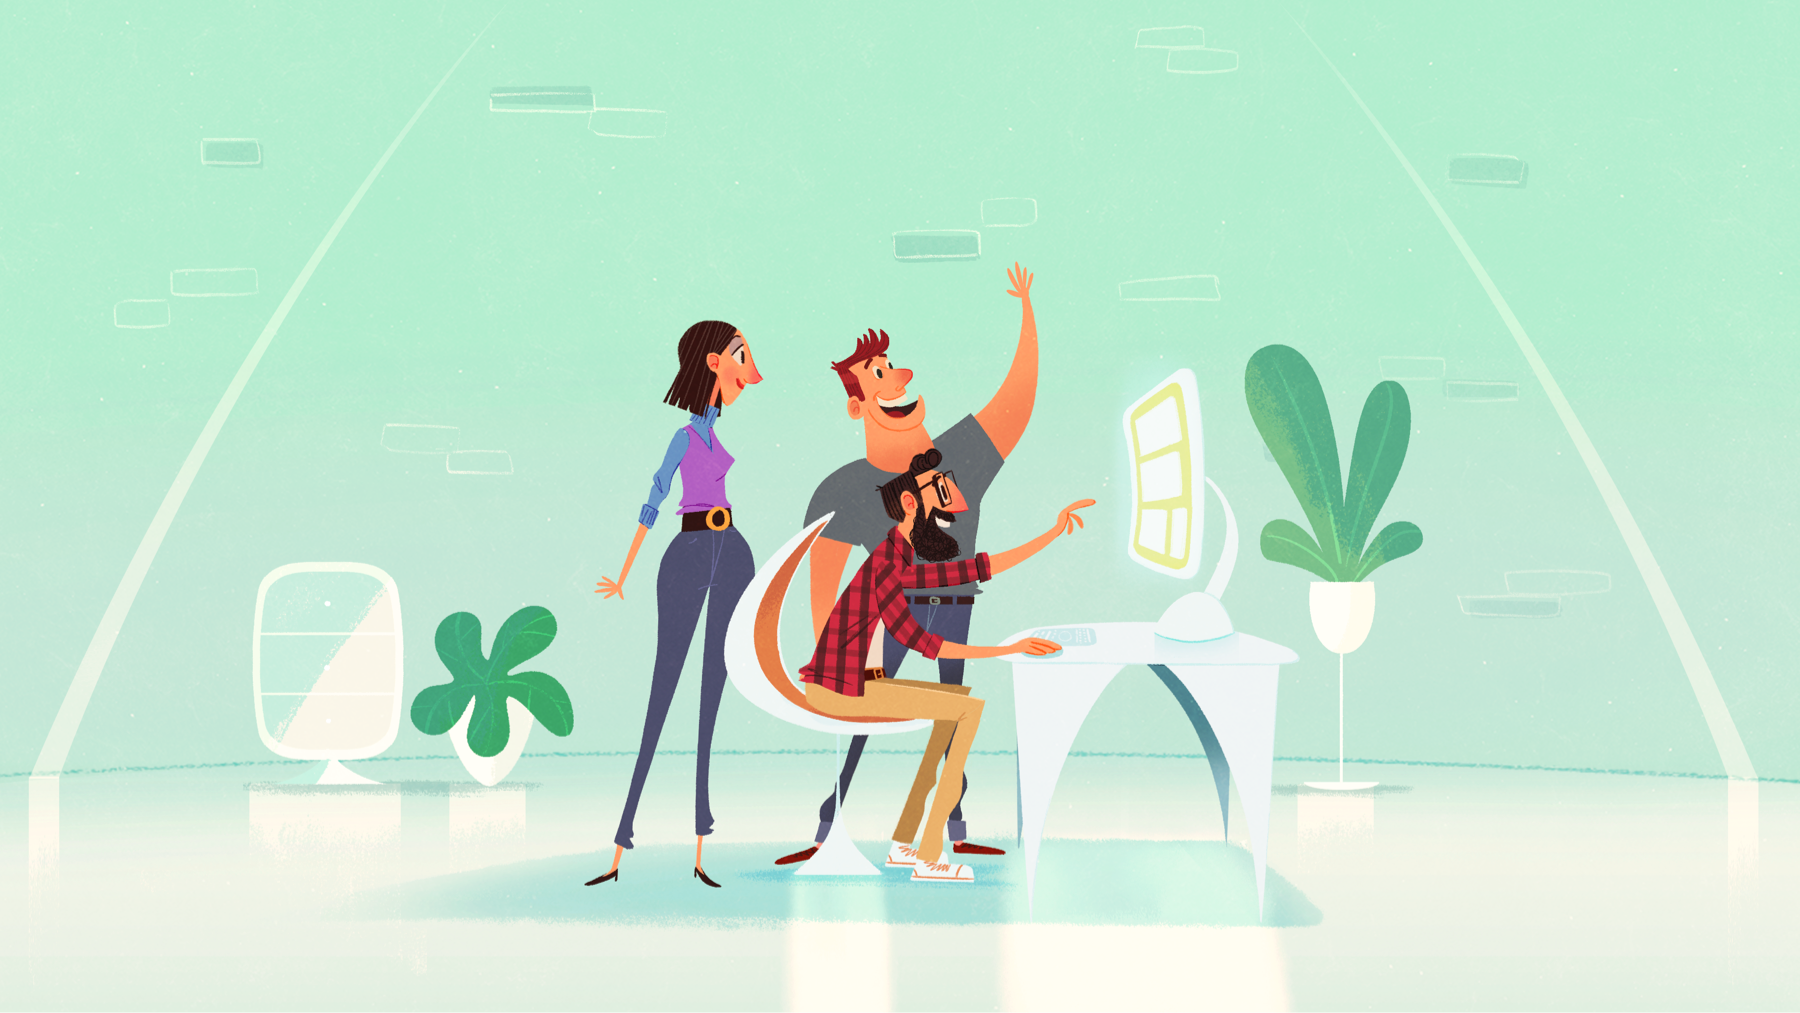 Creative agency wins at web design